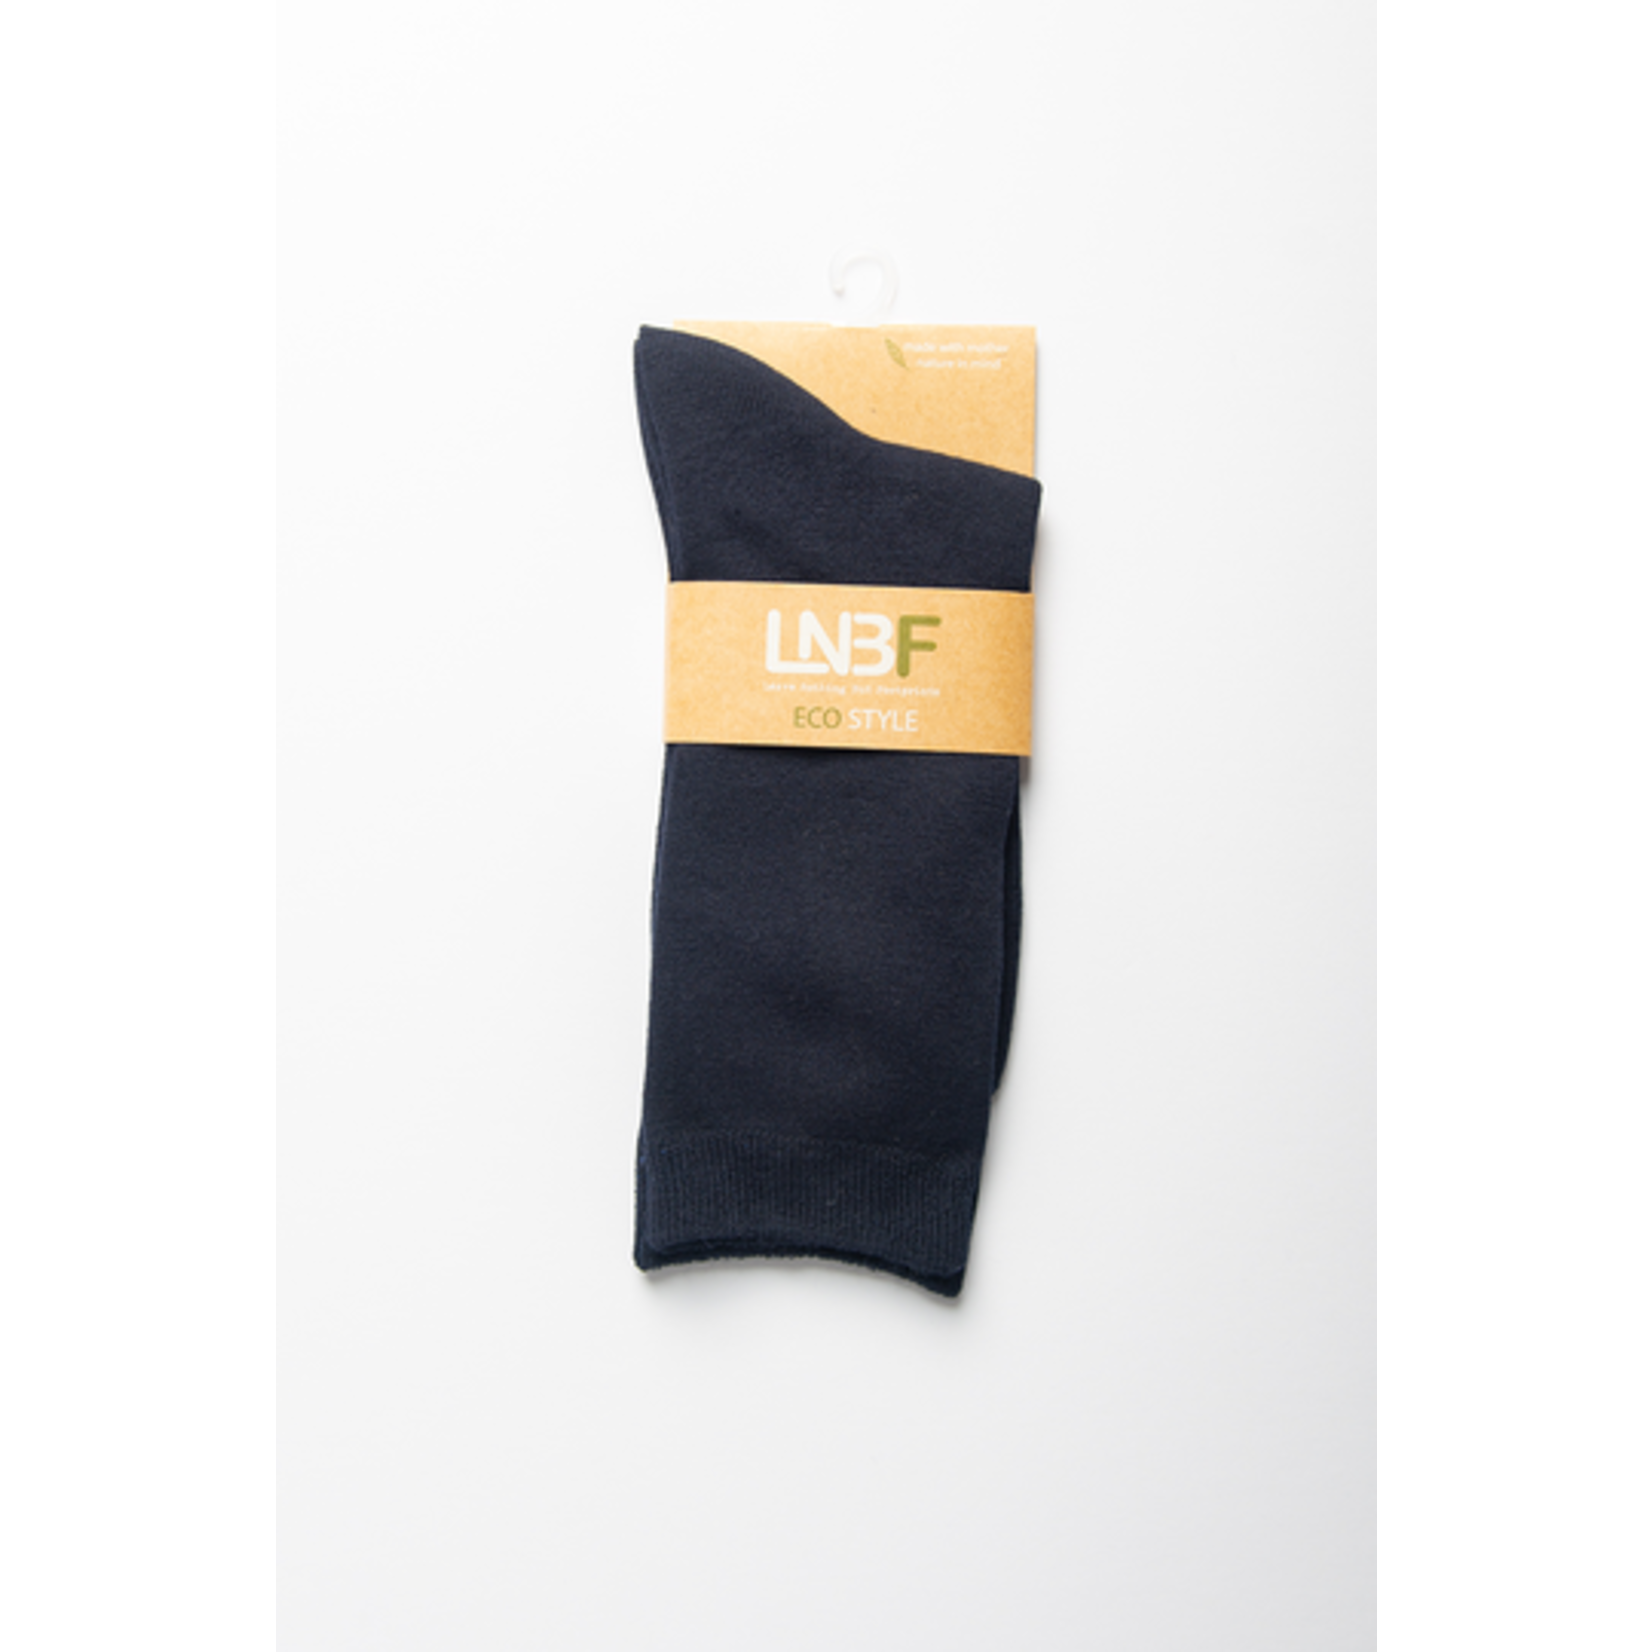 TERRERA LNBF Bamboo  Socks